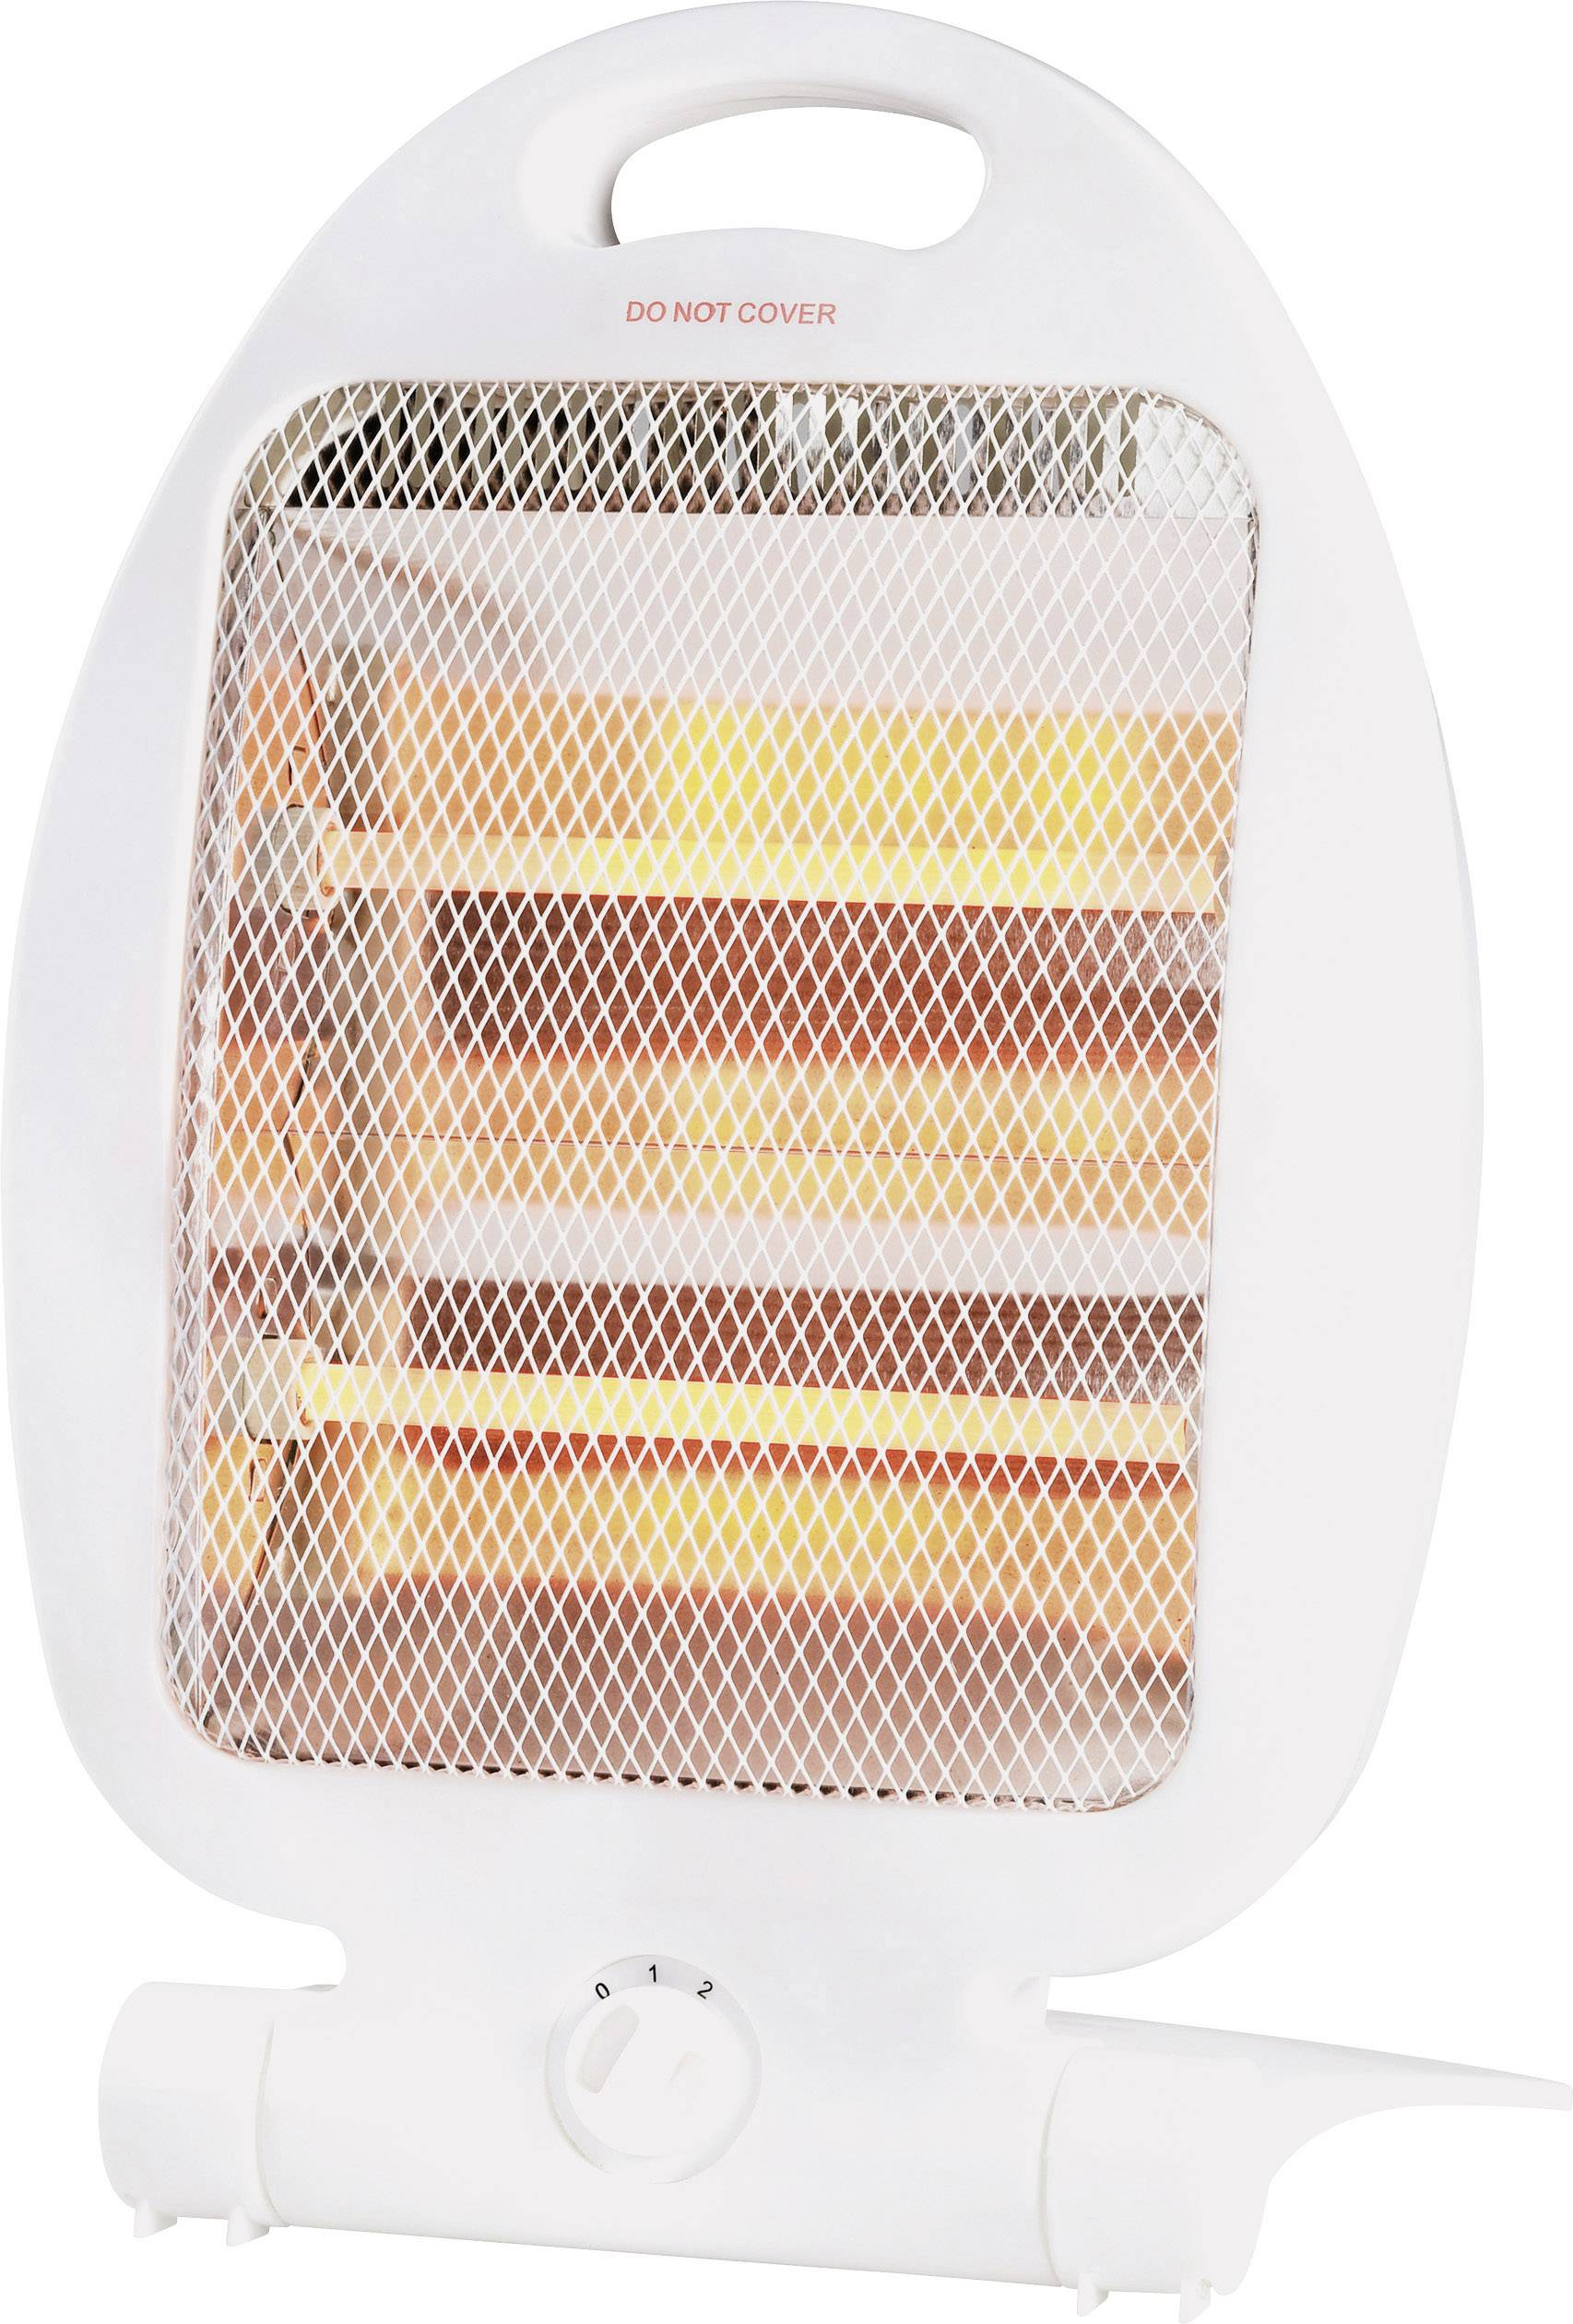 Halogenové topení RH06, 15 m², 400 W, 800 W, bílá